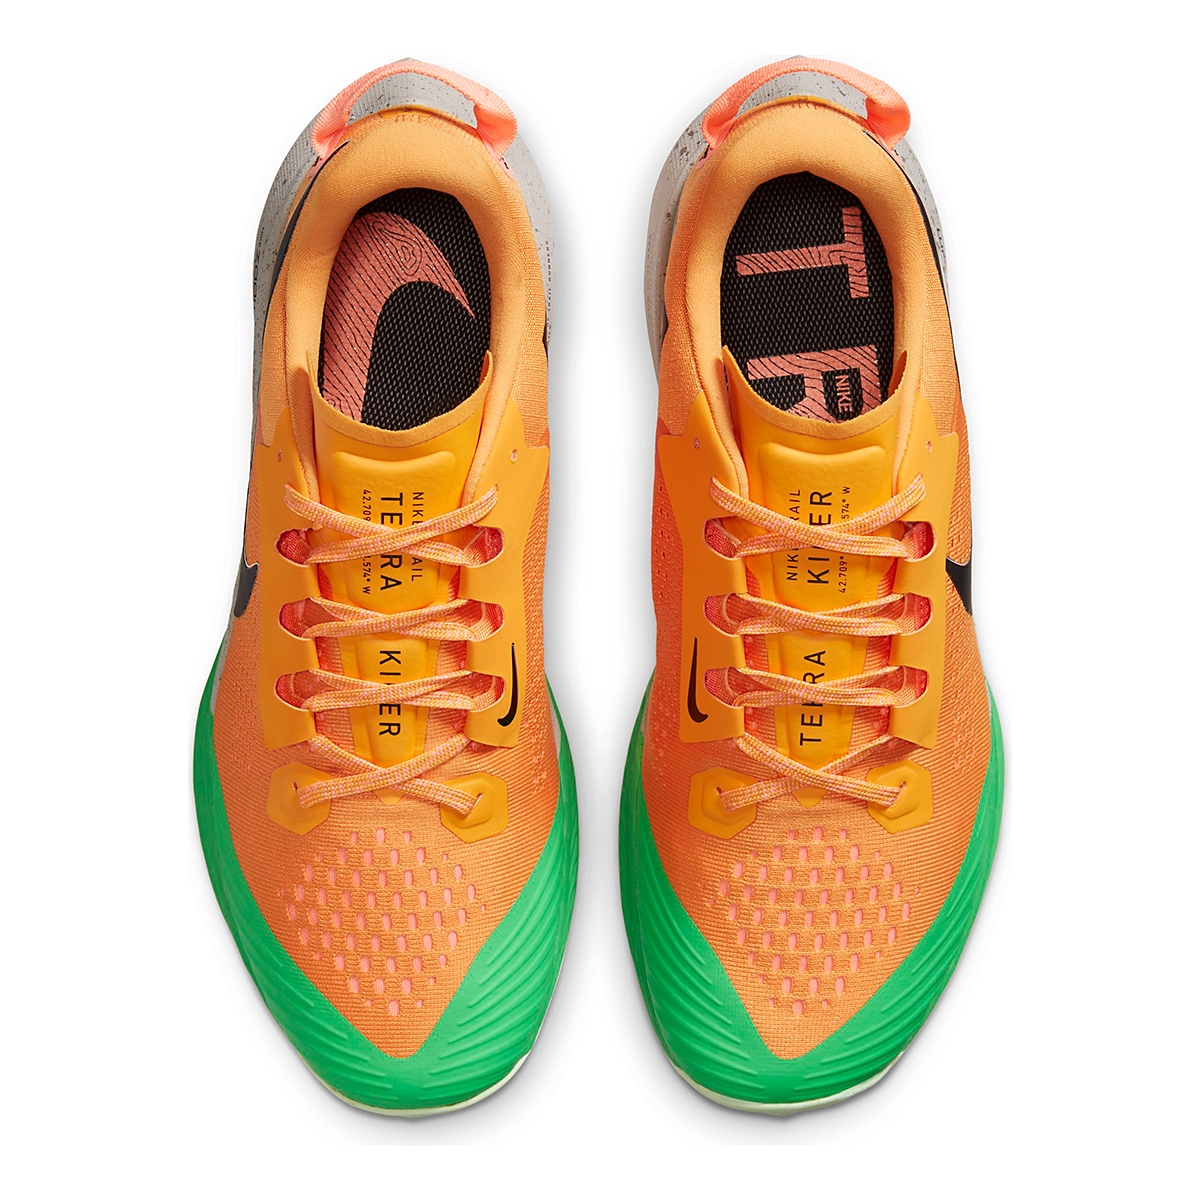 Men's Nike Air Zoom Terra Kiger 6 Trail Running Shoe - Color: Kumquat/Black/Pink Green Spark - Size: 6 - Width: Regular, Kumquat/Black/Pink Green Spark, large, image 4